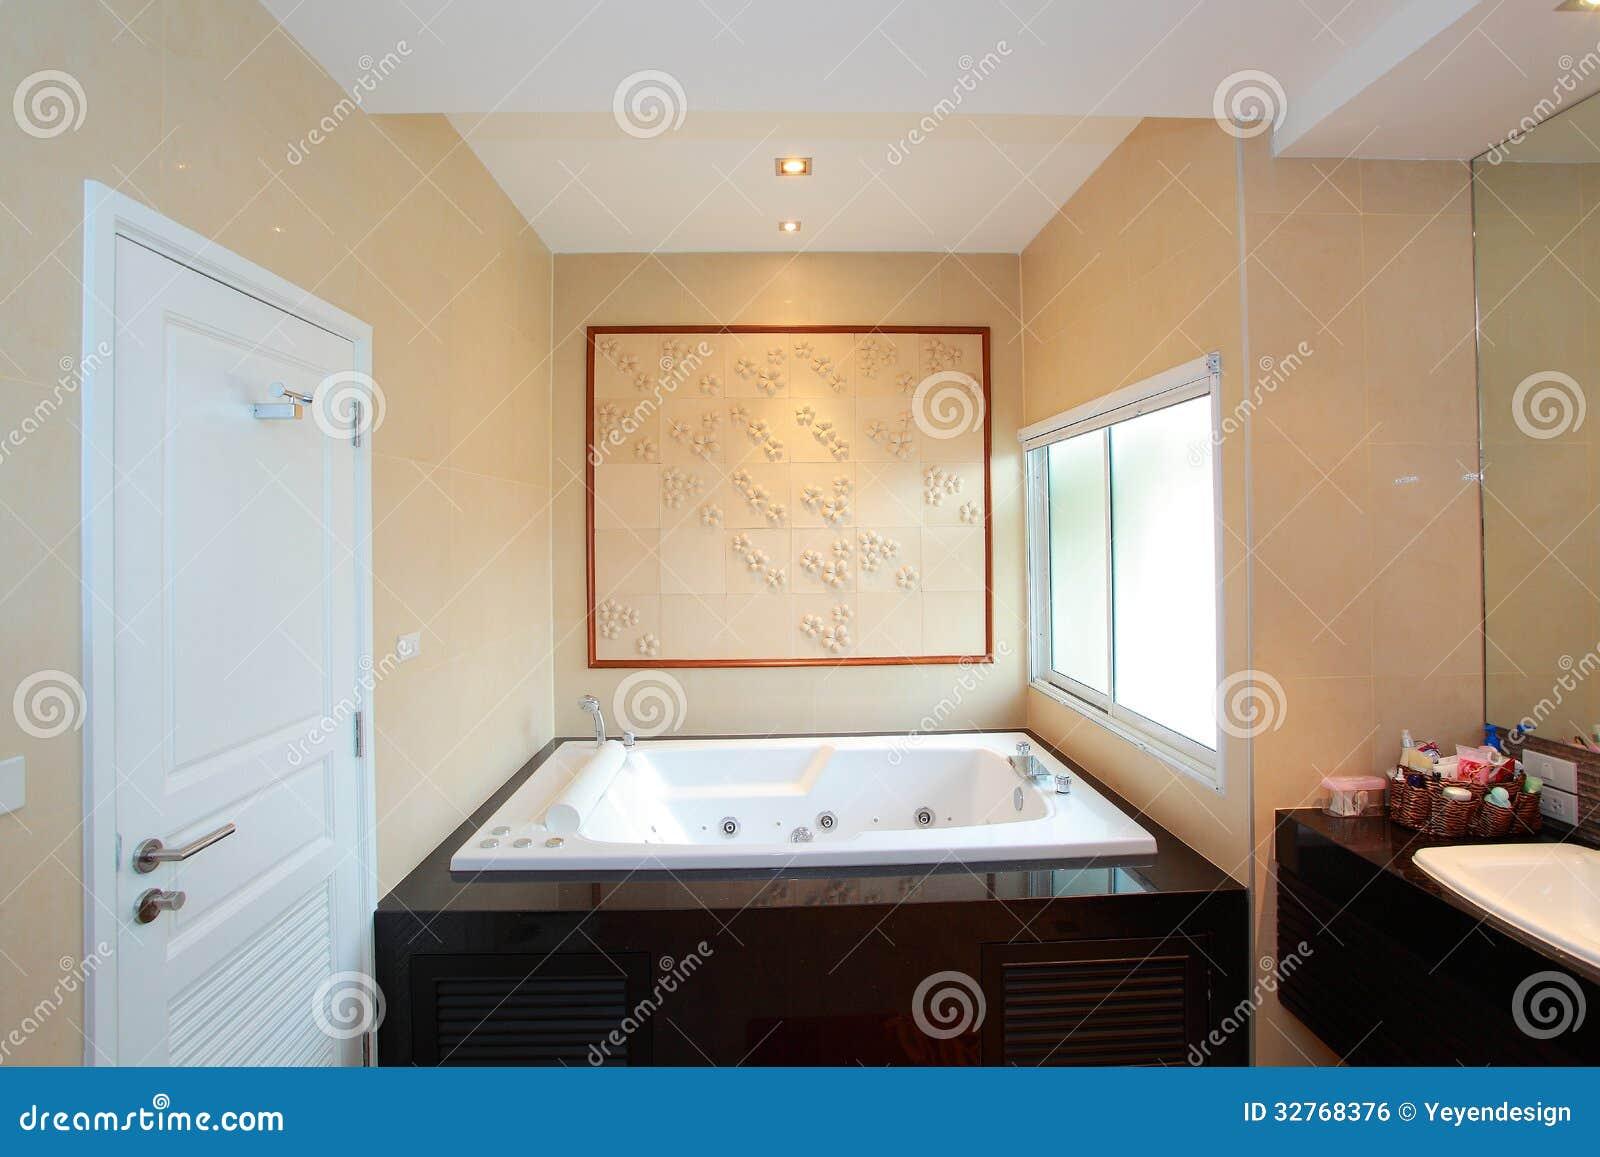 Luxe moderne badkamers royalty vrije stock afbeelding afbeelding 32768376 - Moderne luxe badkamer ...